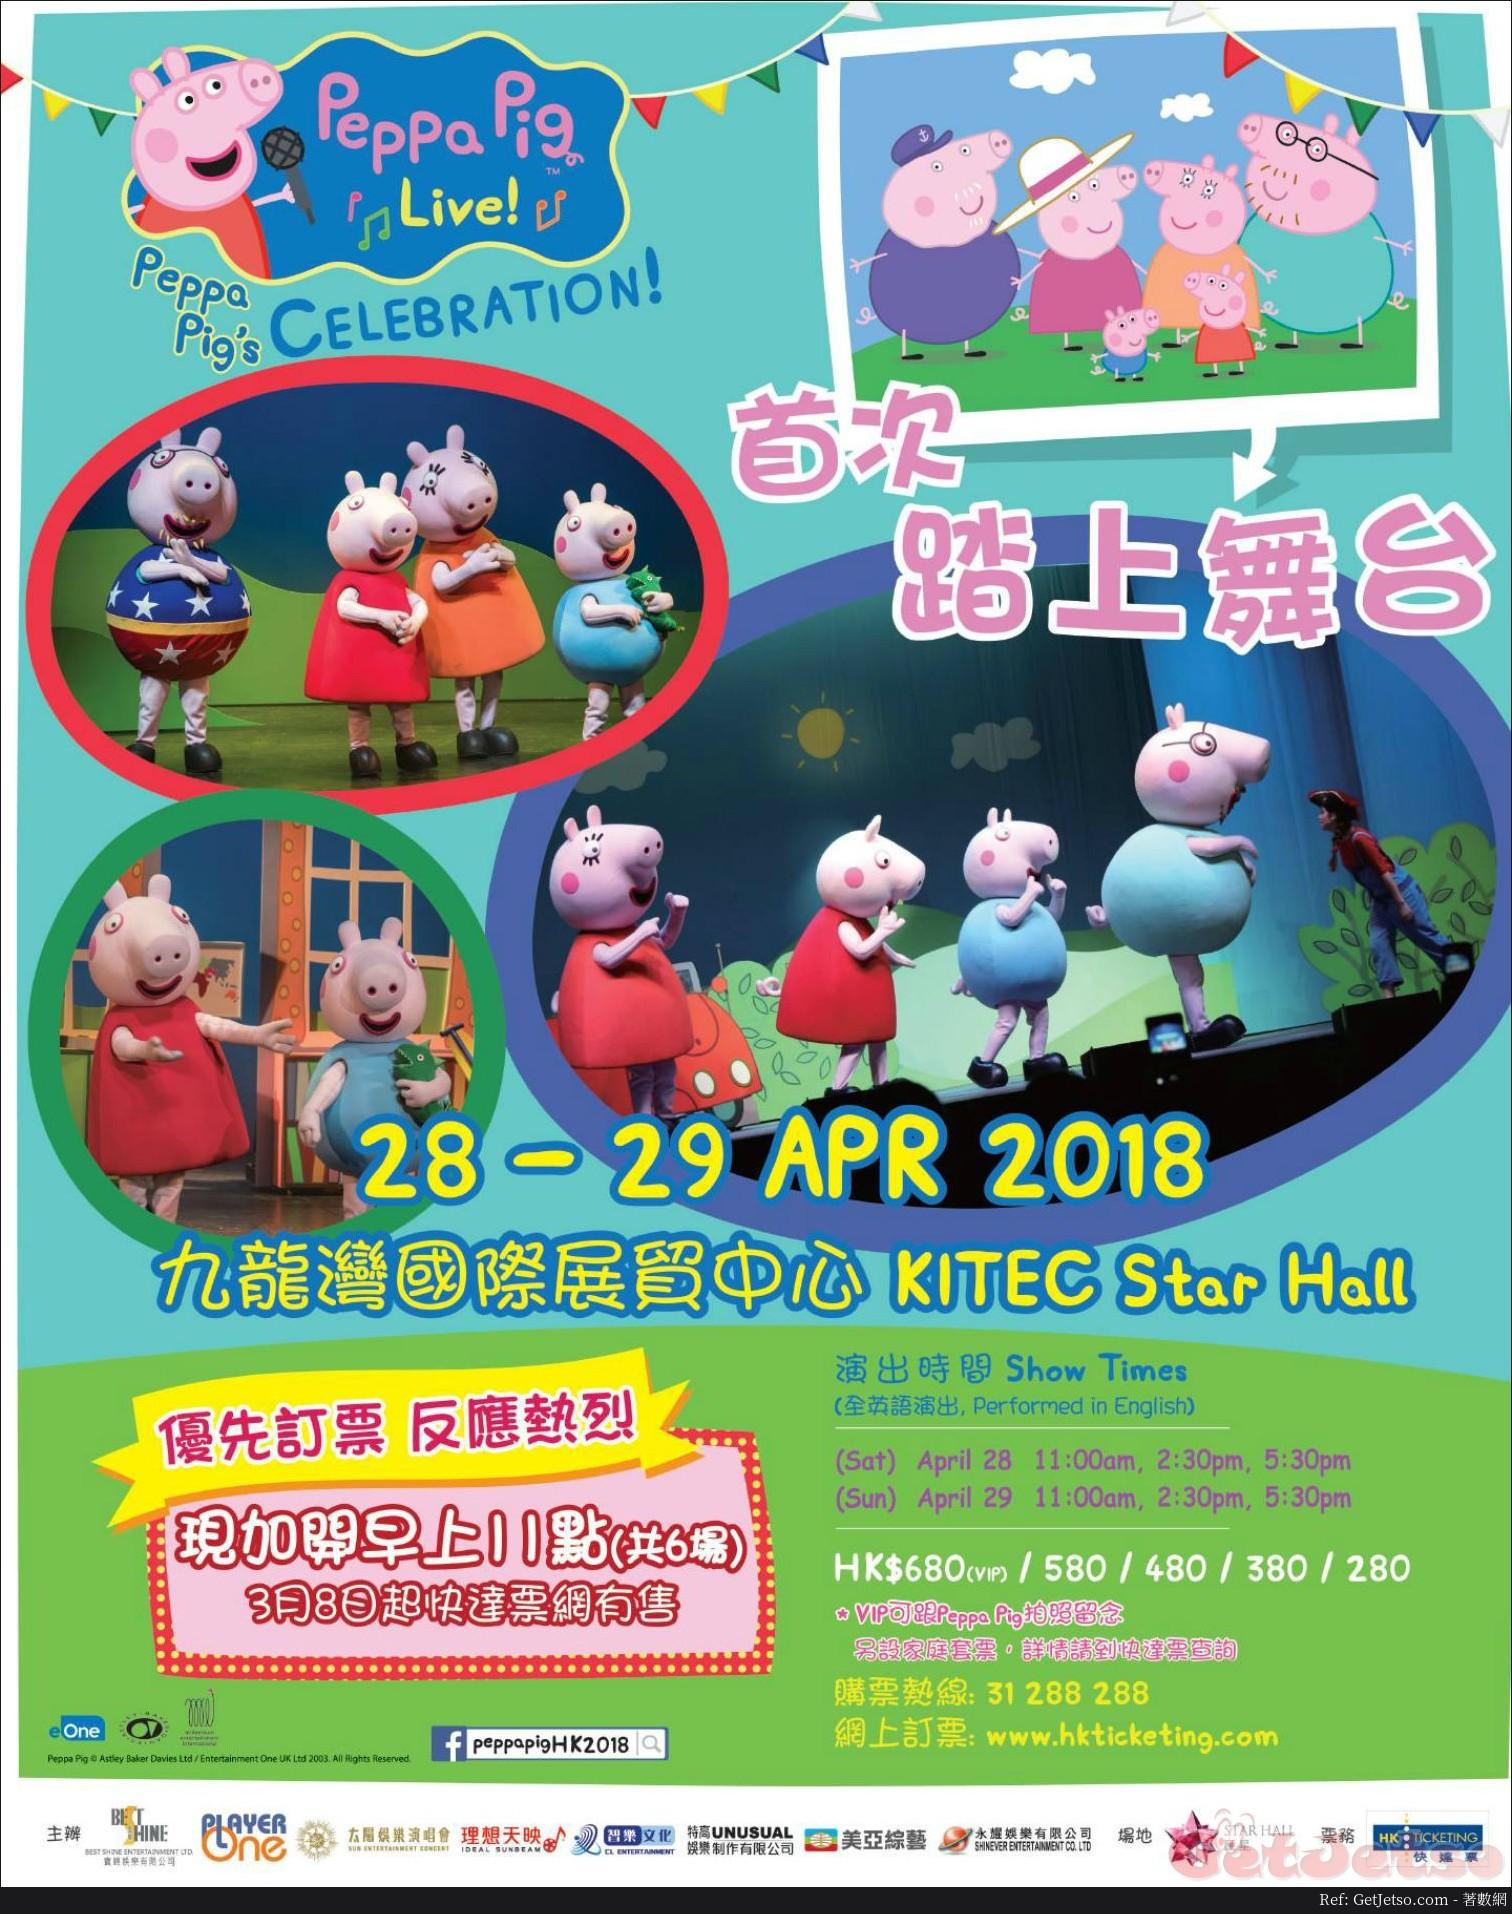 Peppa Pig Live!Peppa Pig's Celebration 音樂劇優先訂票(18年3月8日起)